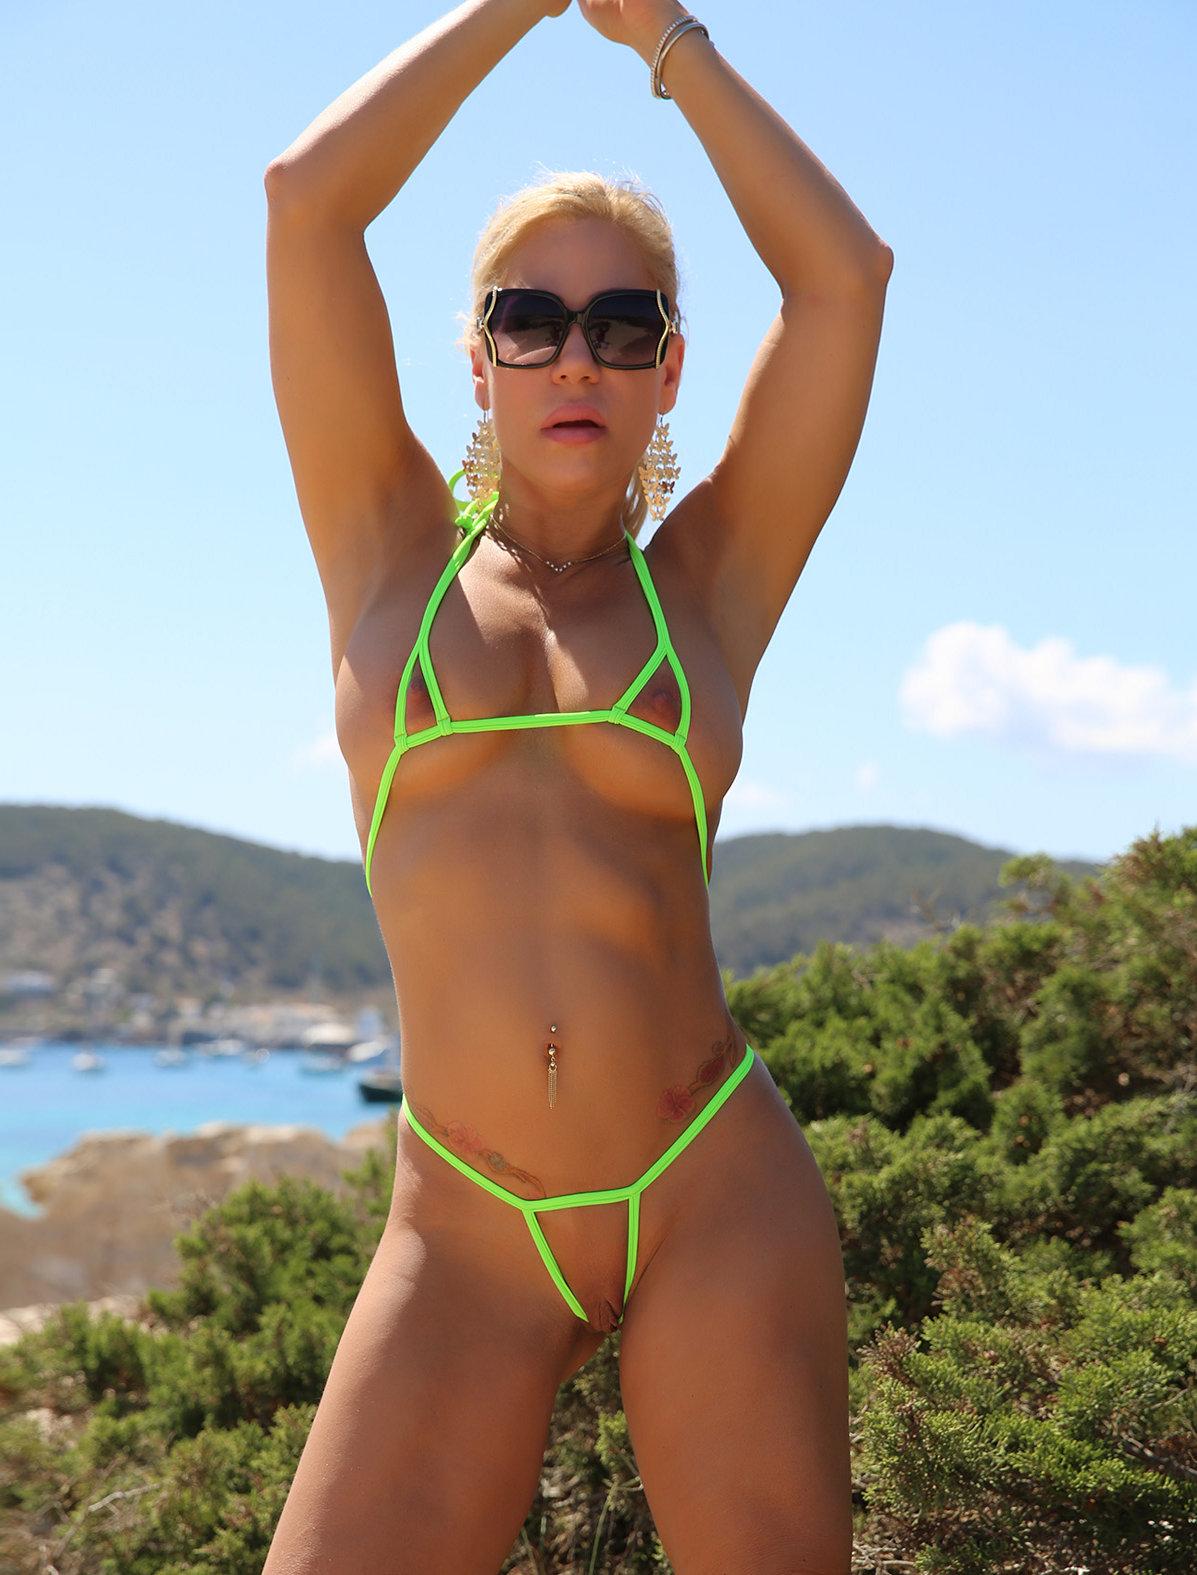 Crotchless bikini galleries — 7